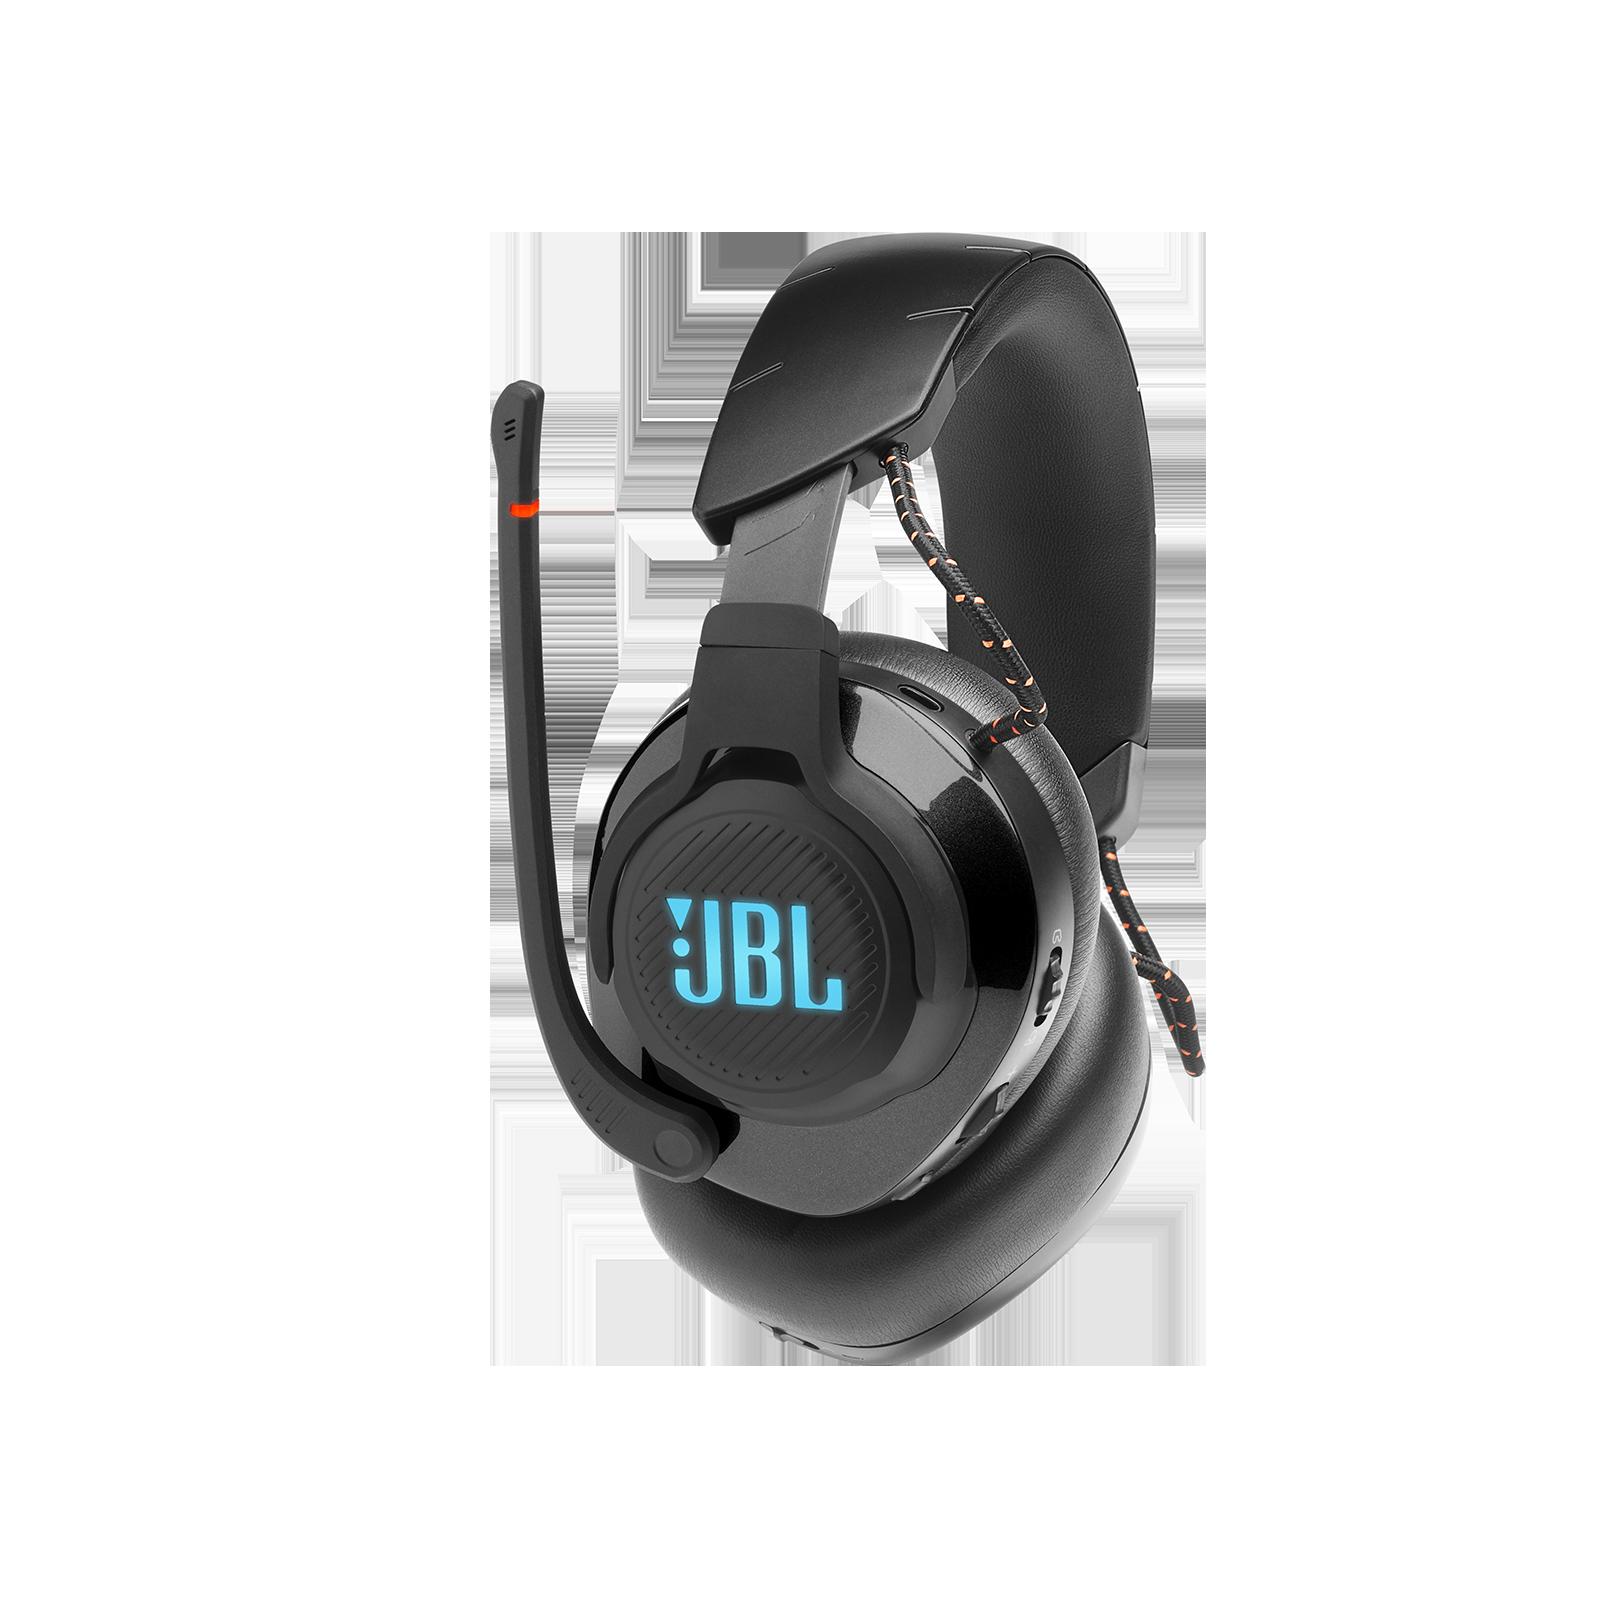 Jbl Quantum 600 Wireless Gaming Headset